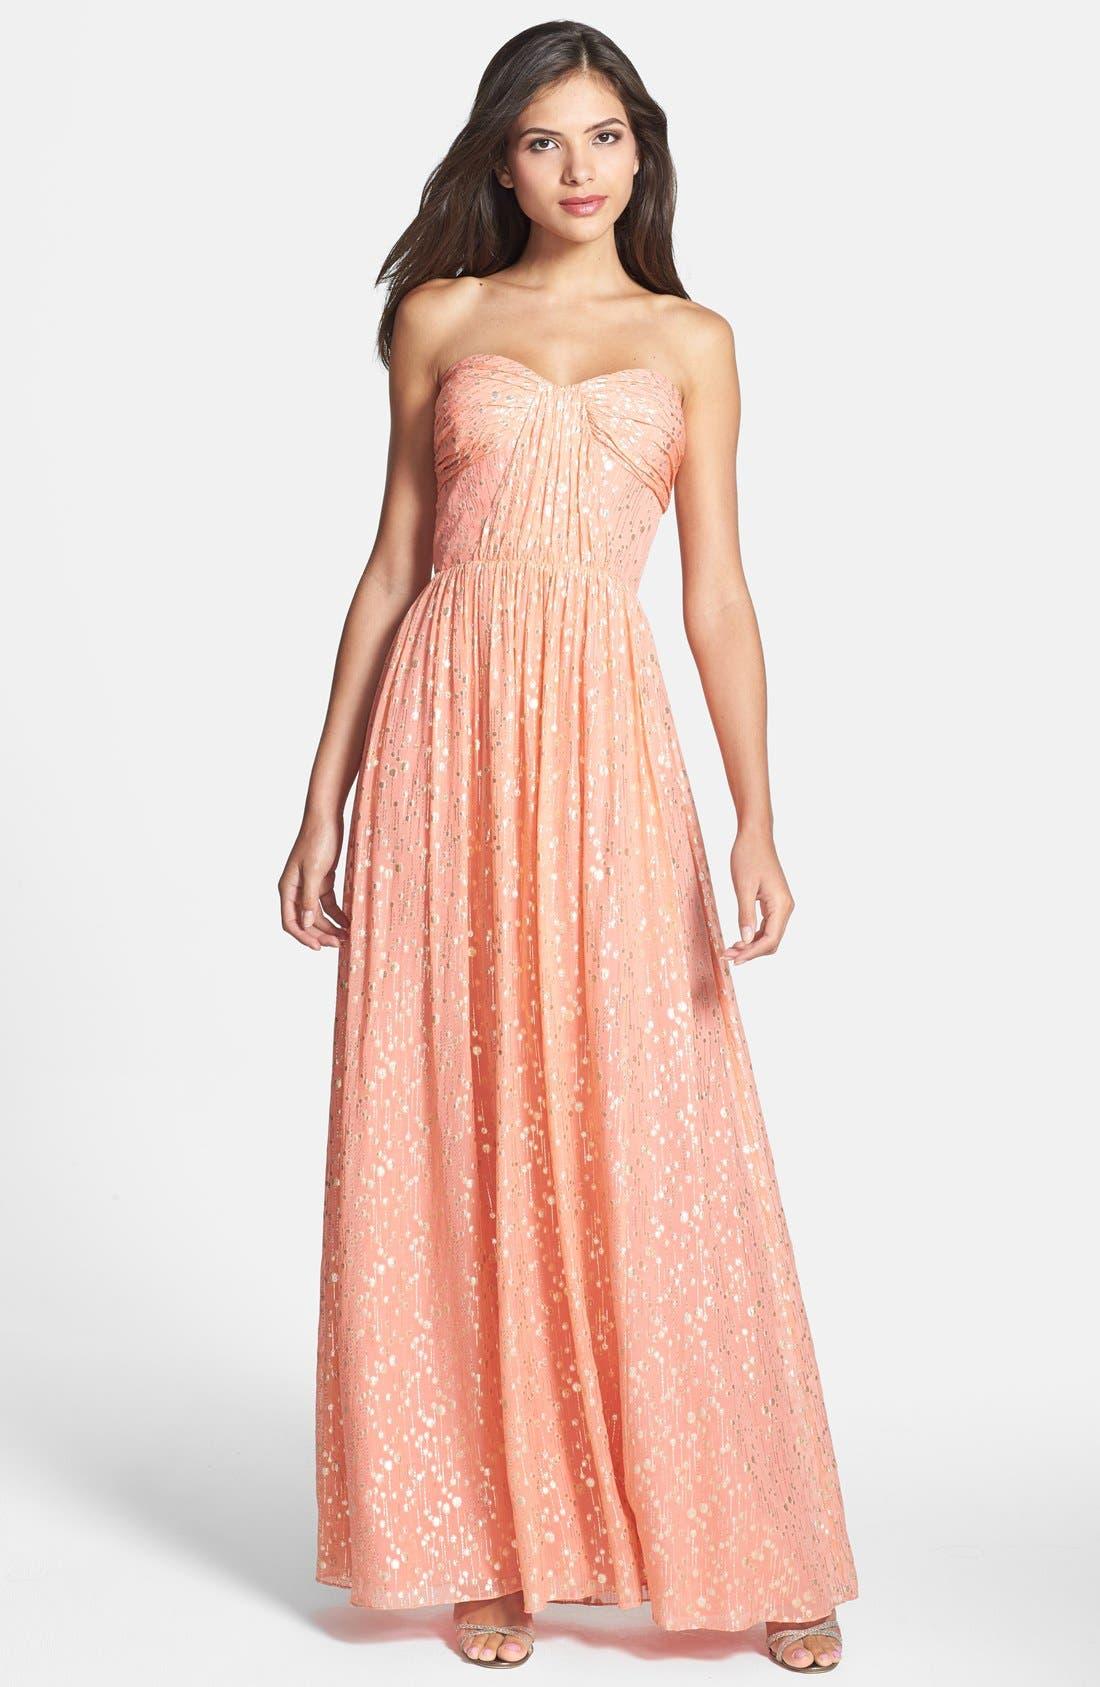 ERIN ERIN FETHERSTON, 'Monique' Foiled Silk Chiffon Gown, Main thumbnail 1, color, 950